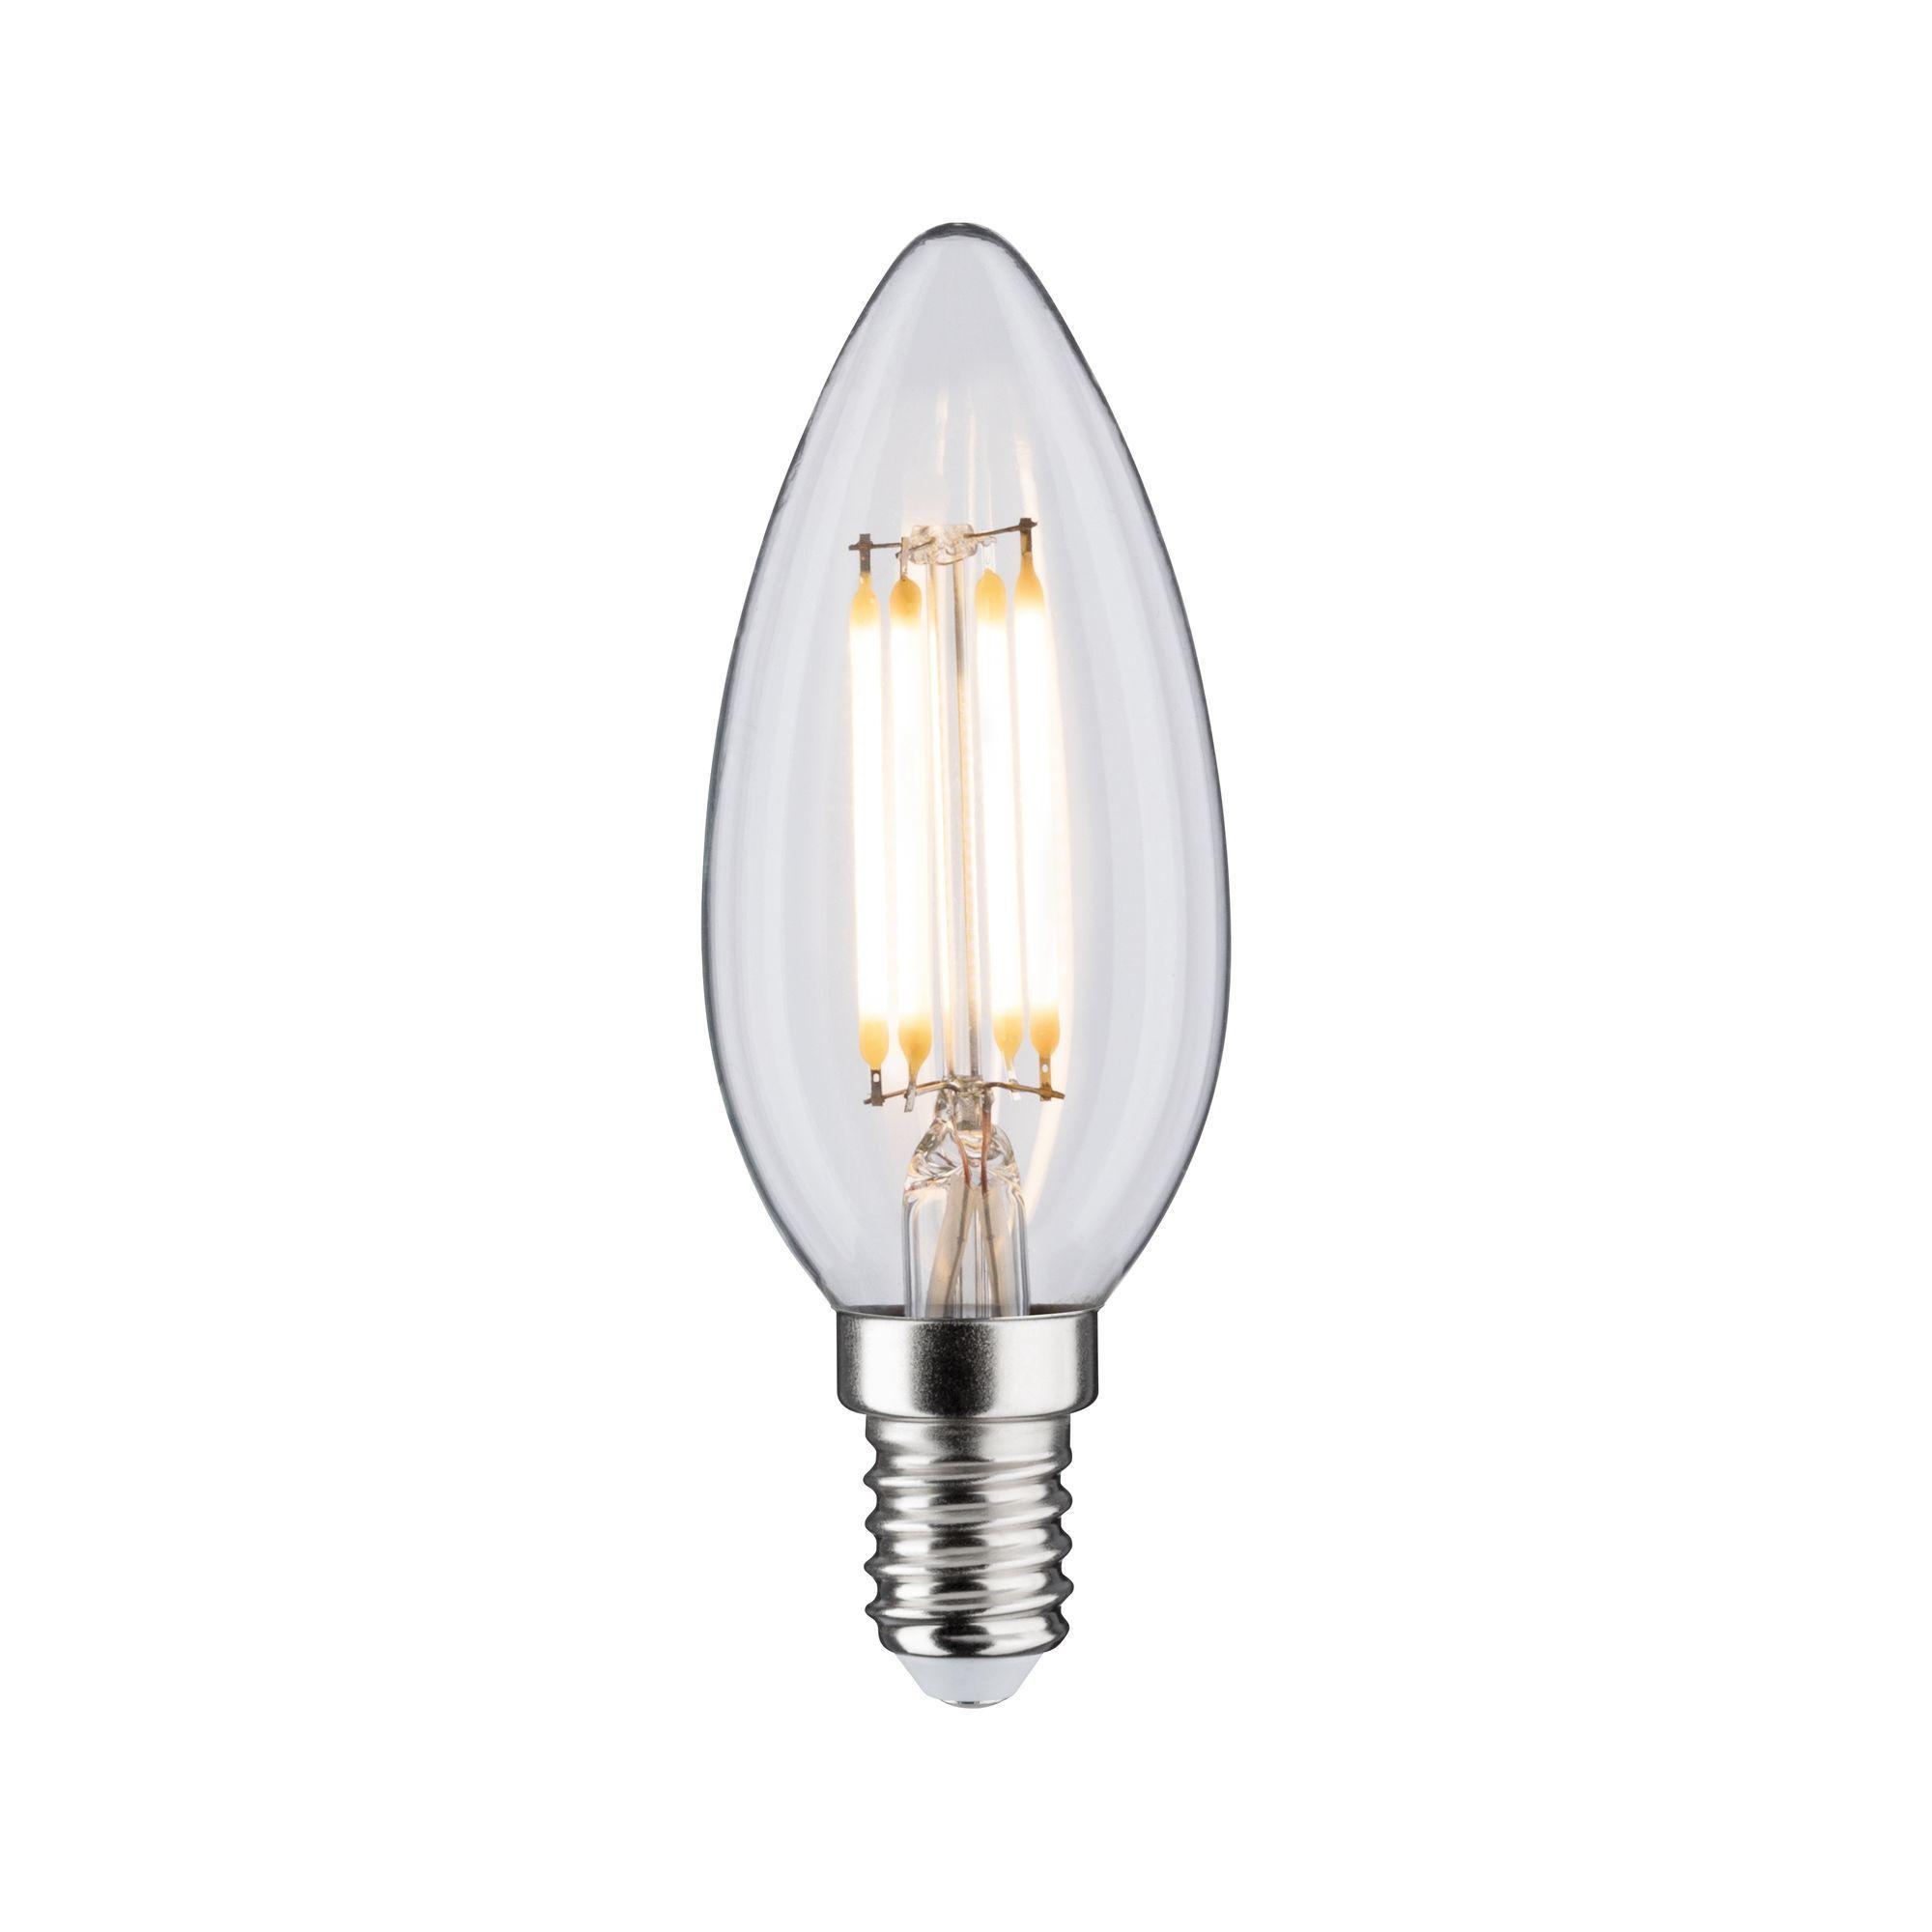 Paulmann LED Fil Kerze 470lm E14 2700K klar 4,5W 230V (28611)